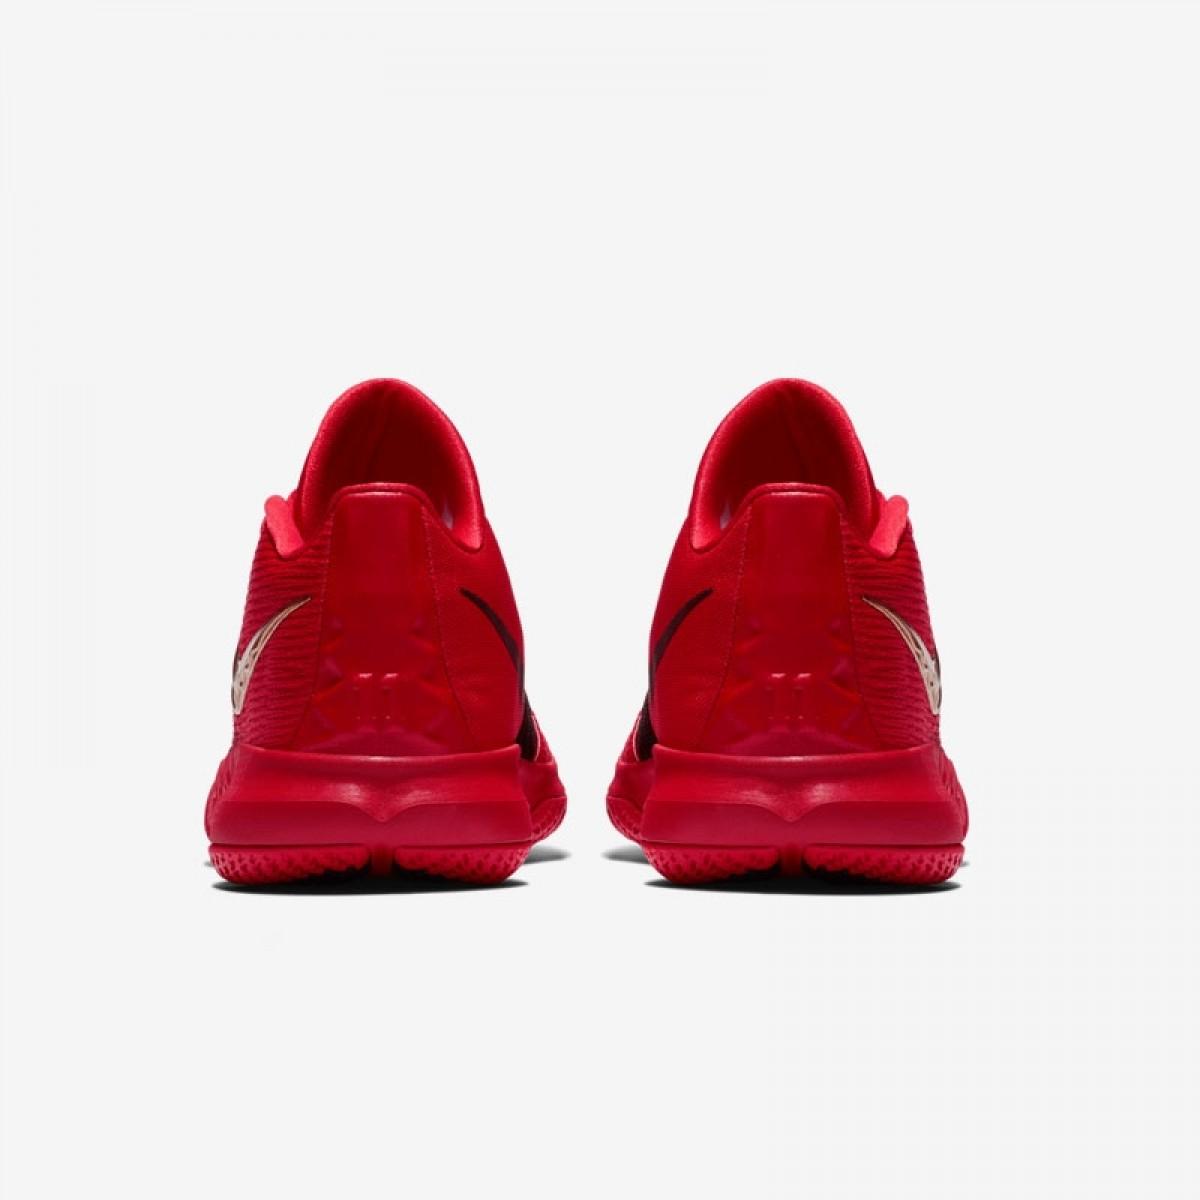 Nike Kyrie Flytrap Jr 'Red October' AA7071-600-Jr